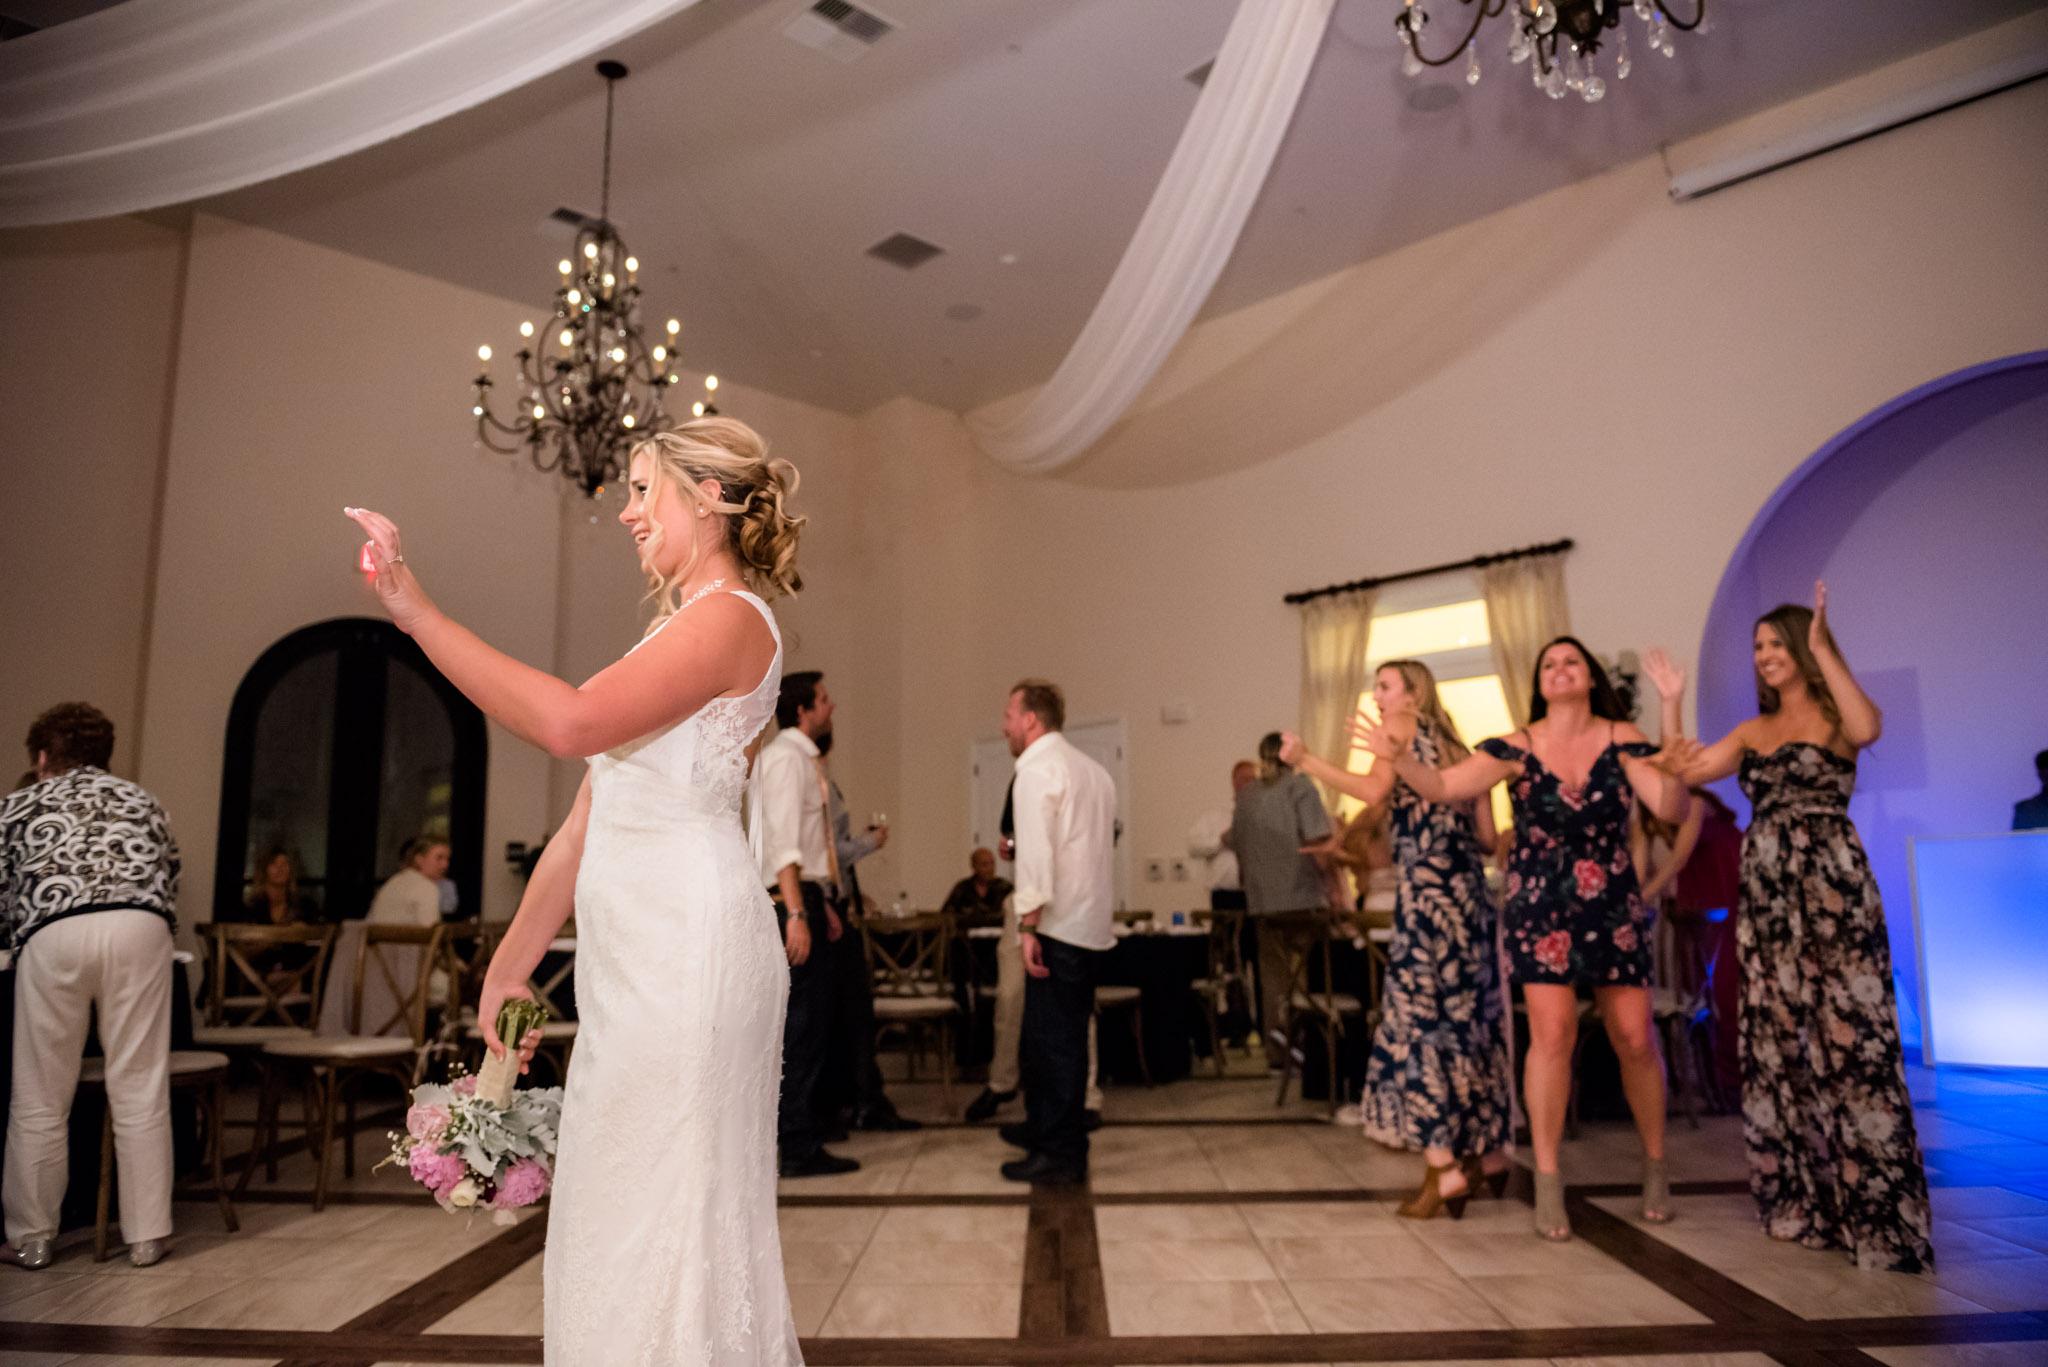 Avensole-Winery-Temecula-Wedding-Josh-and-Olivia-4422.JPG